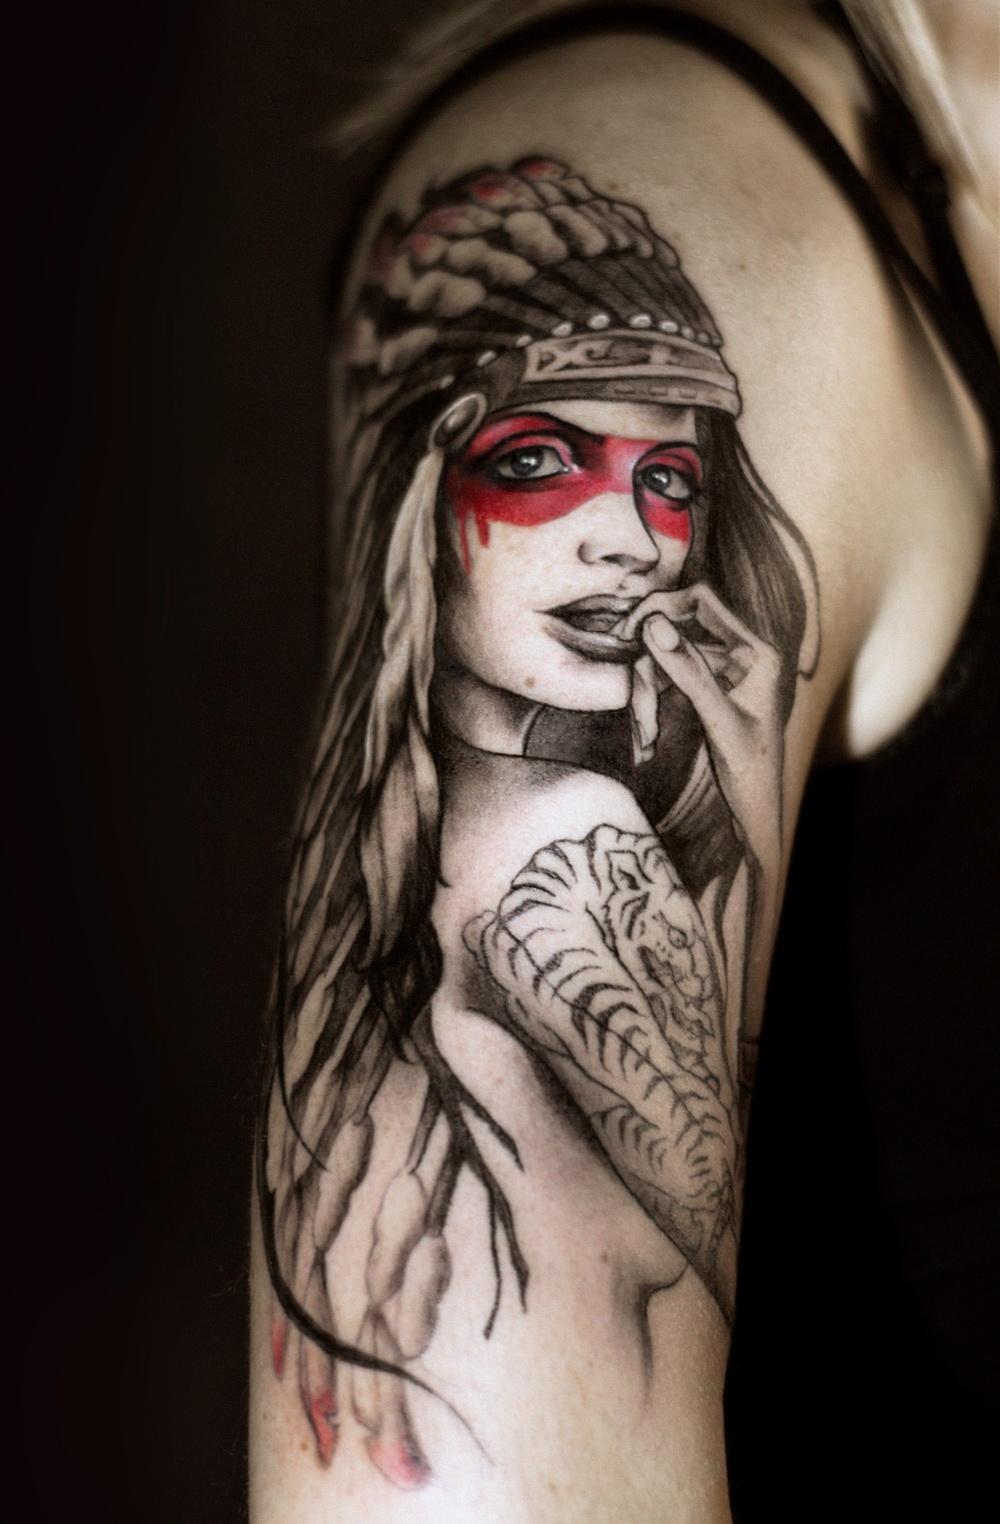 Tatuerare och foto:  Alejandra Andres, tatuerare i Barcelona